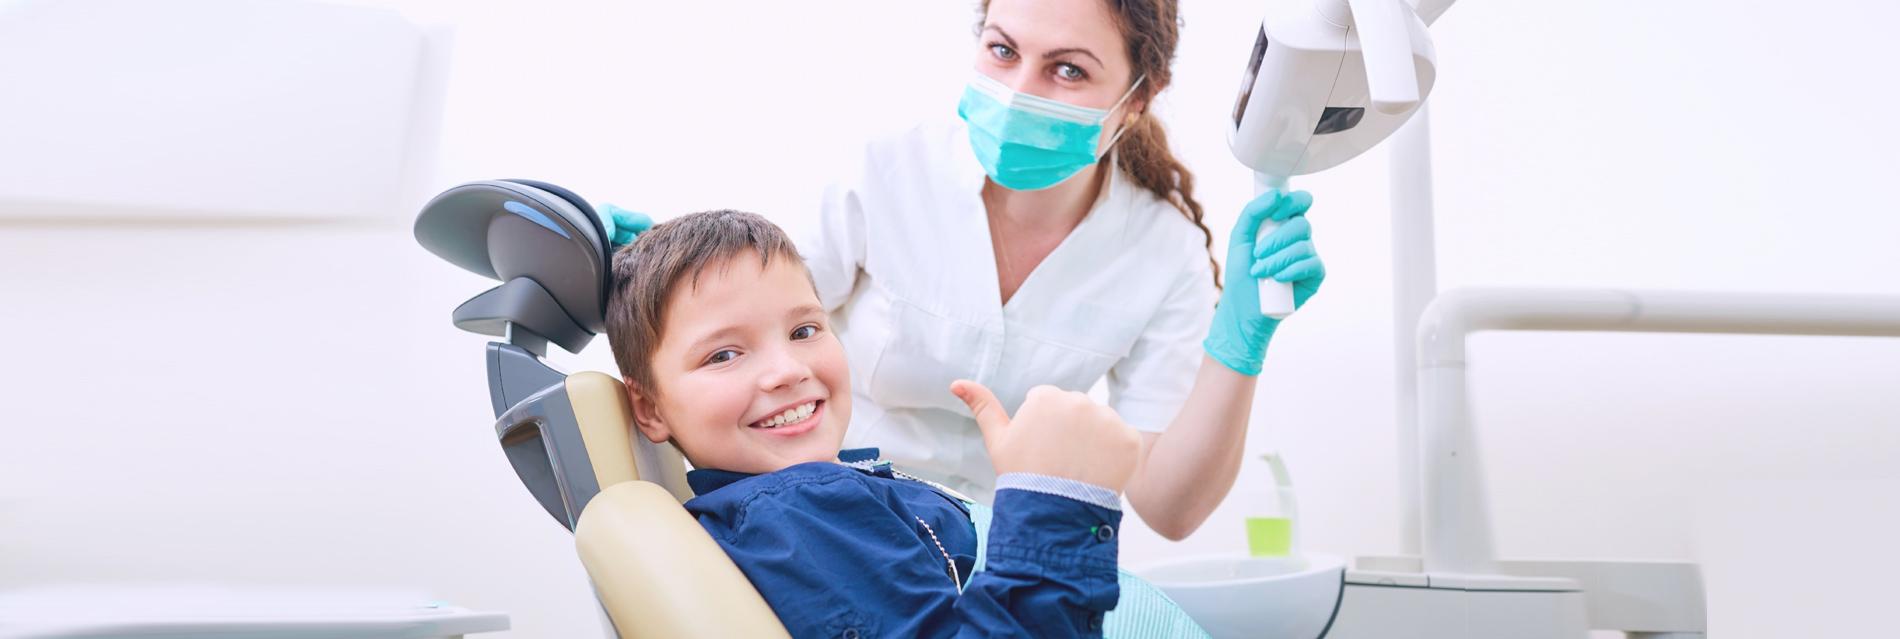 Heroes Dental - Family Dentist McAllen,Texas | Pediatric